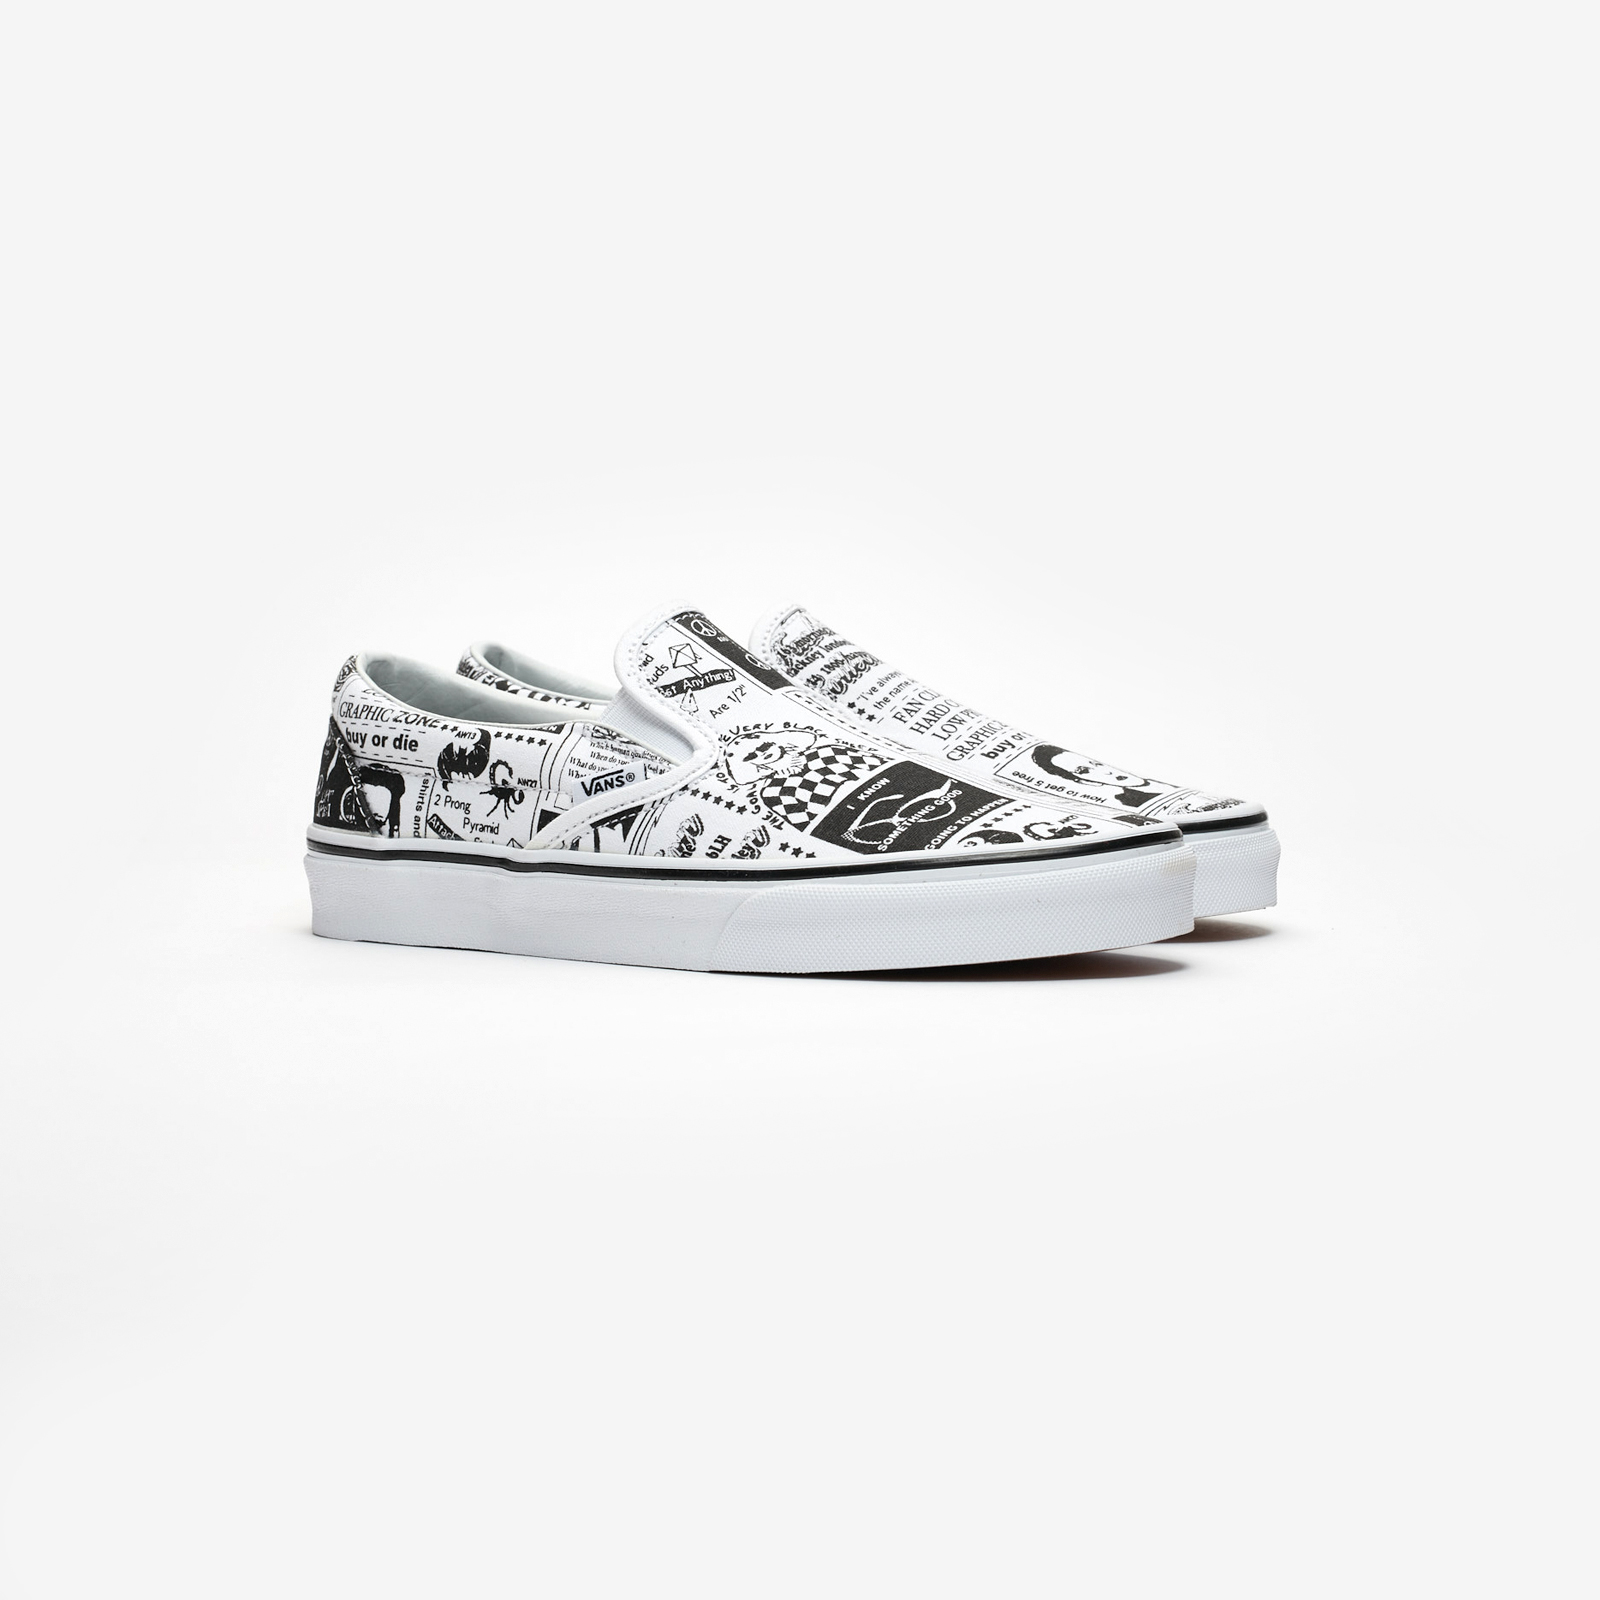 Vans x Ashley Williams Classic Slip On Shoes